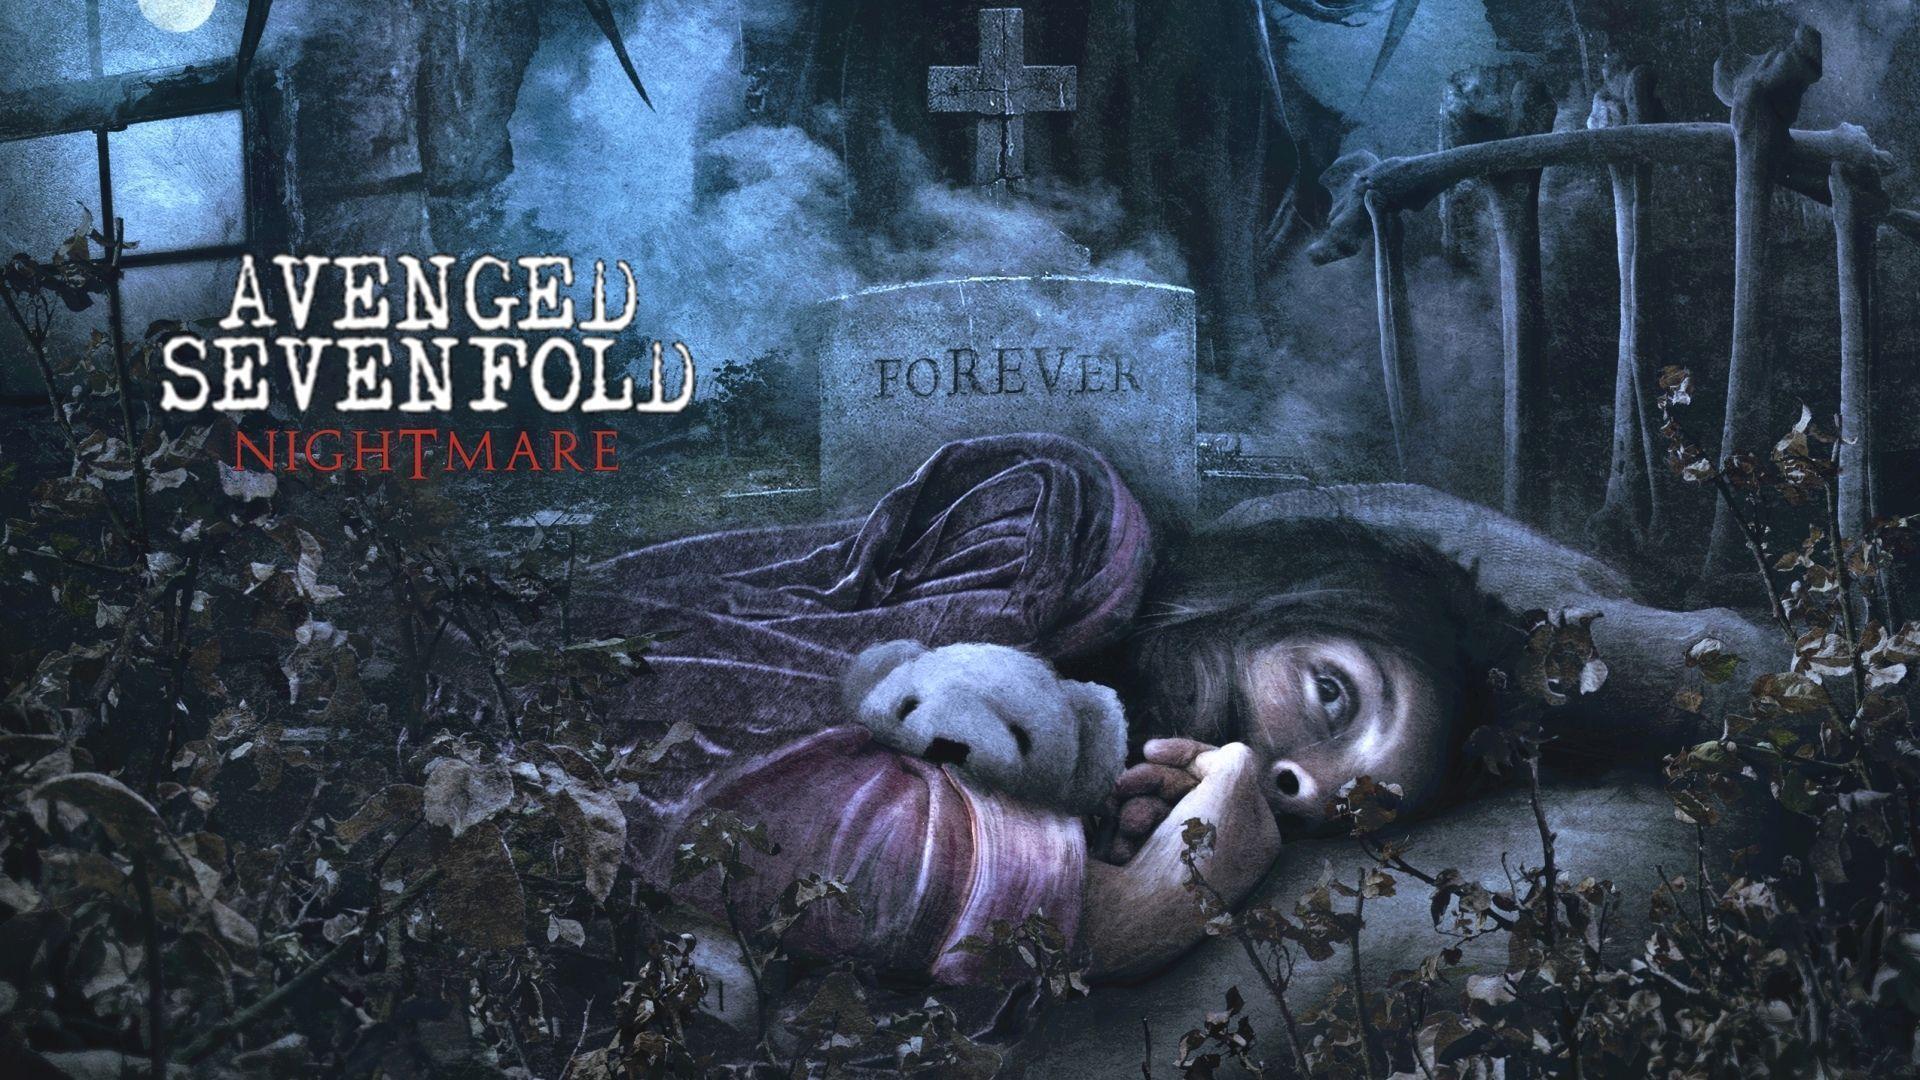 Wallpaper Abyss Avanged Sevenfold | Free Download Wallpaper .